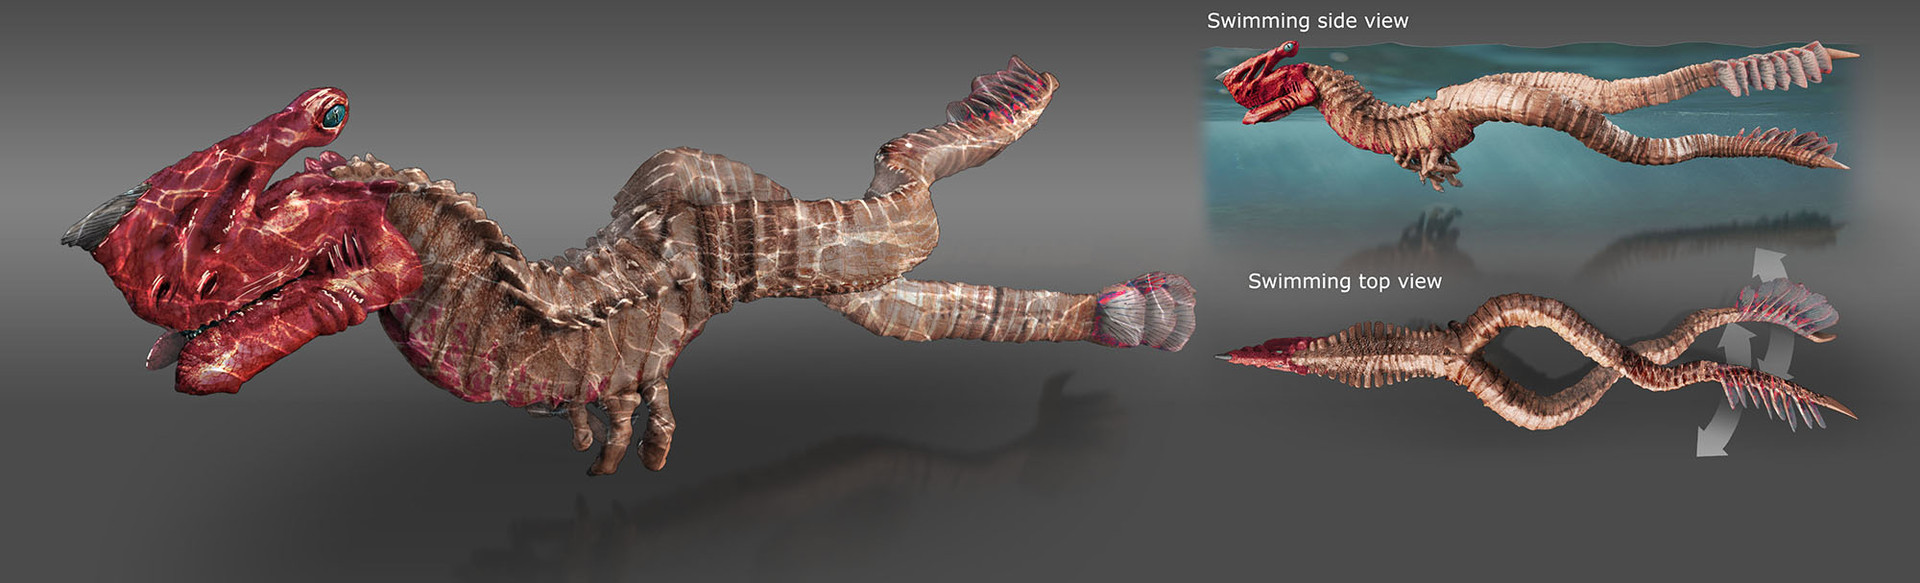 Grimm Odds - Gore-Head Gator - Swimming Pose